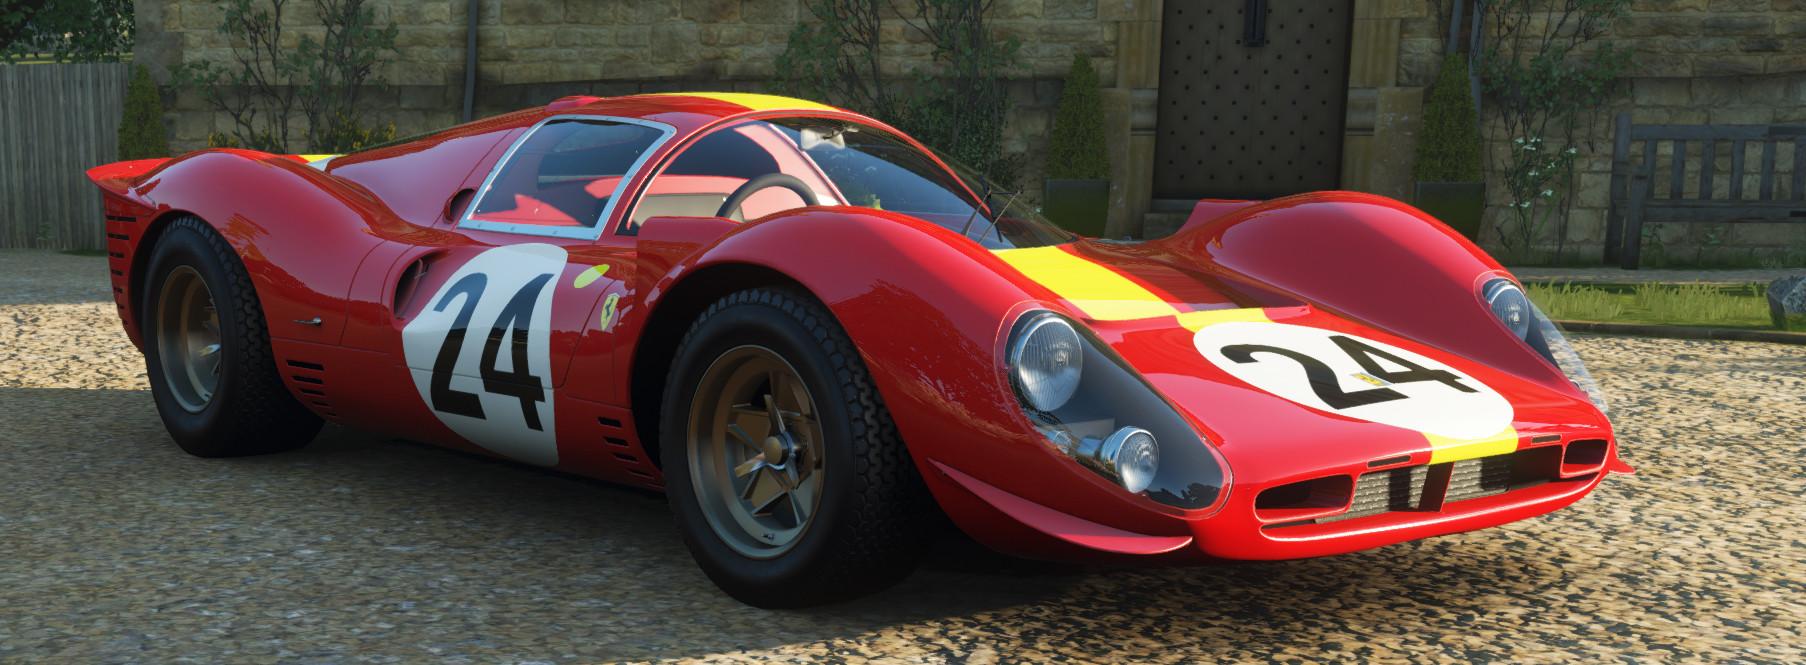 screenshot of the Ferrari #24 Ferrari Spa 330 P4